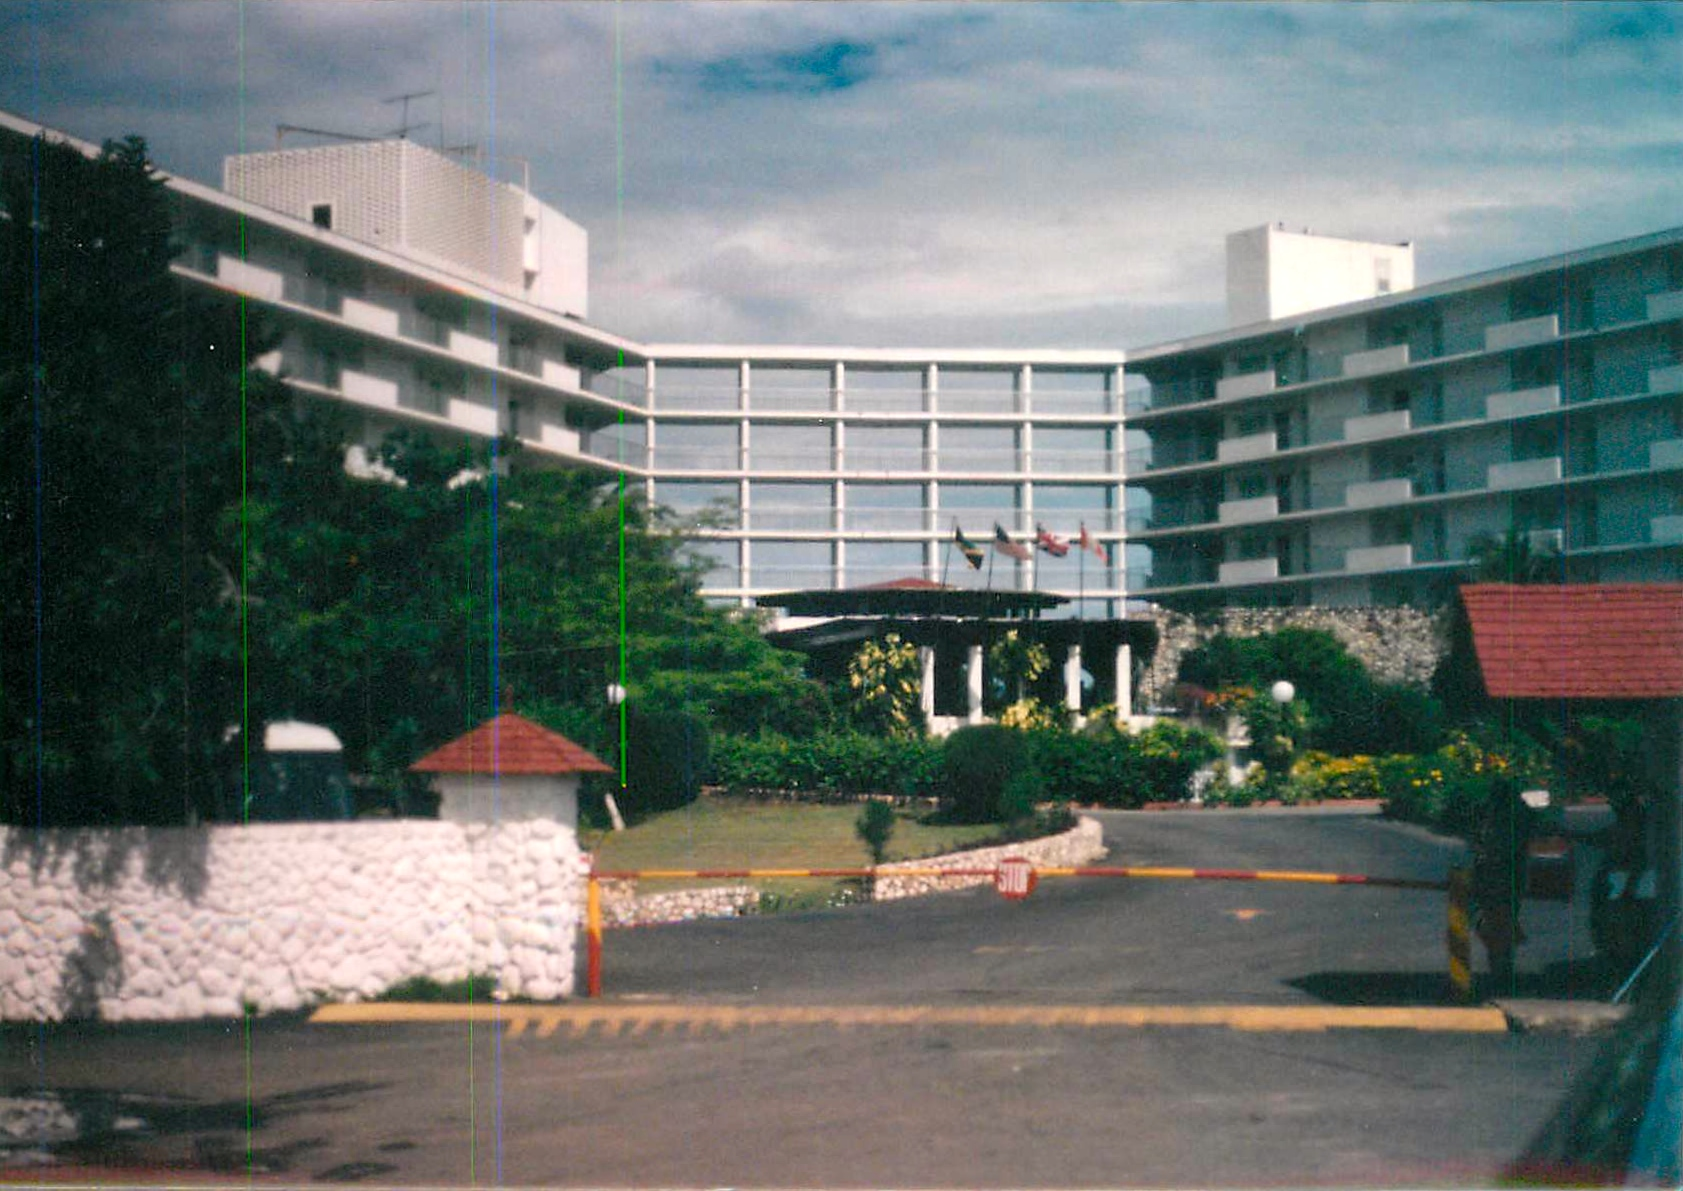 Trelawny Bch Hotel.jpg